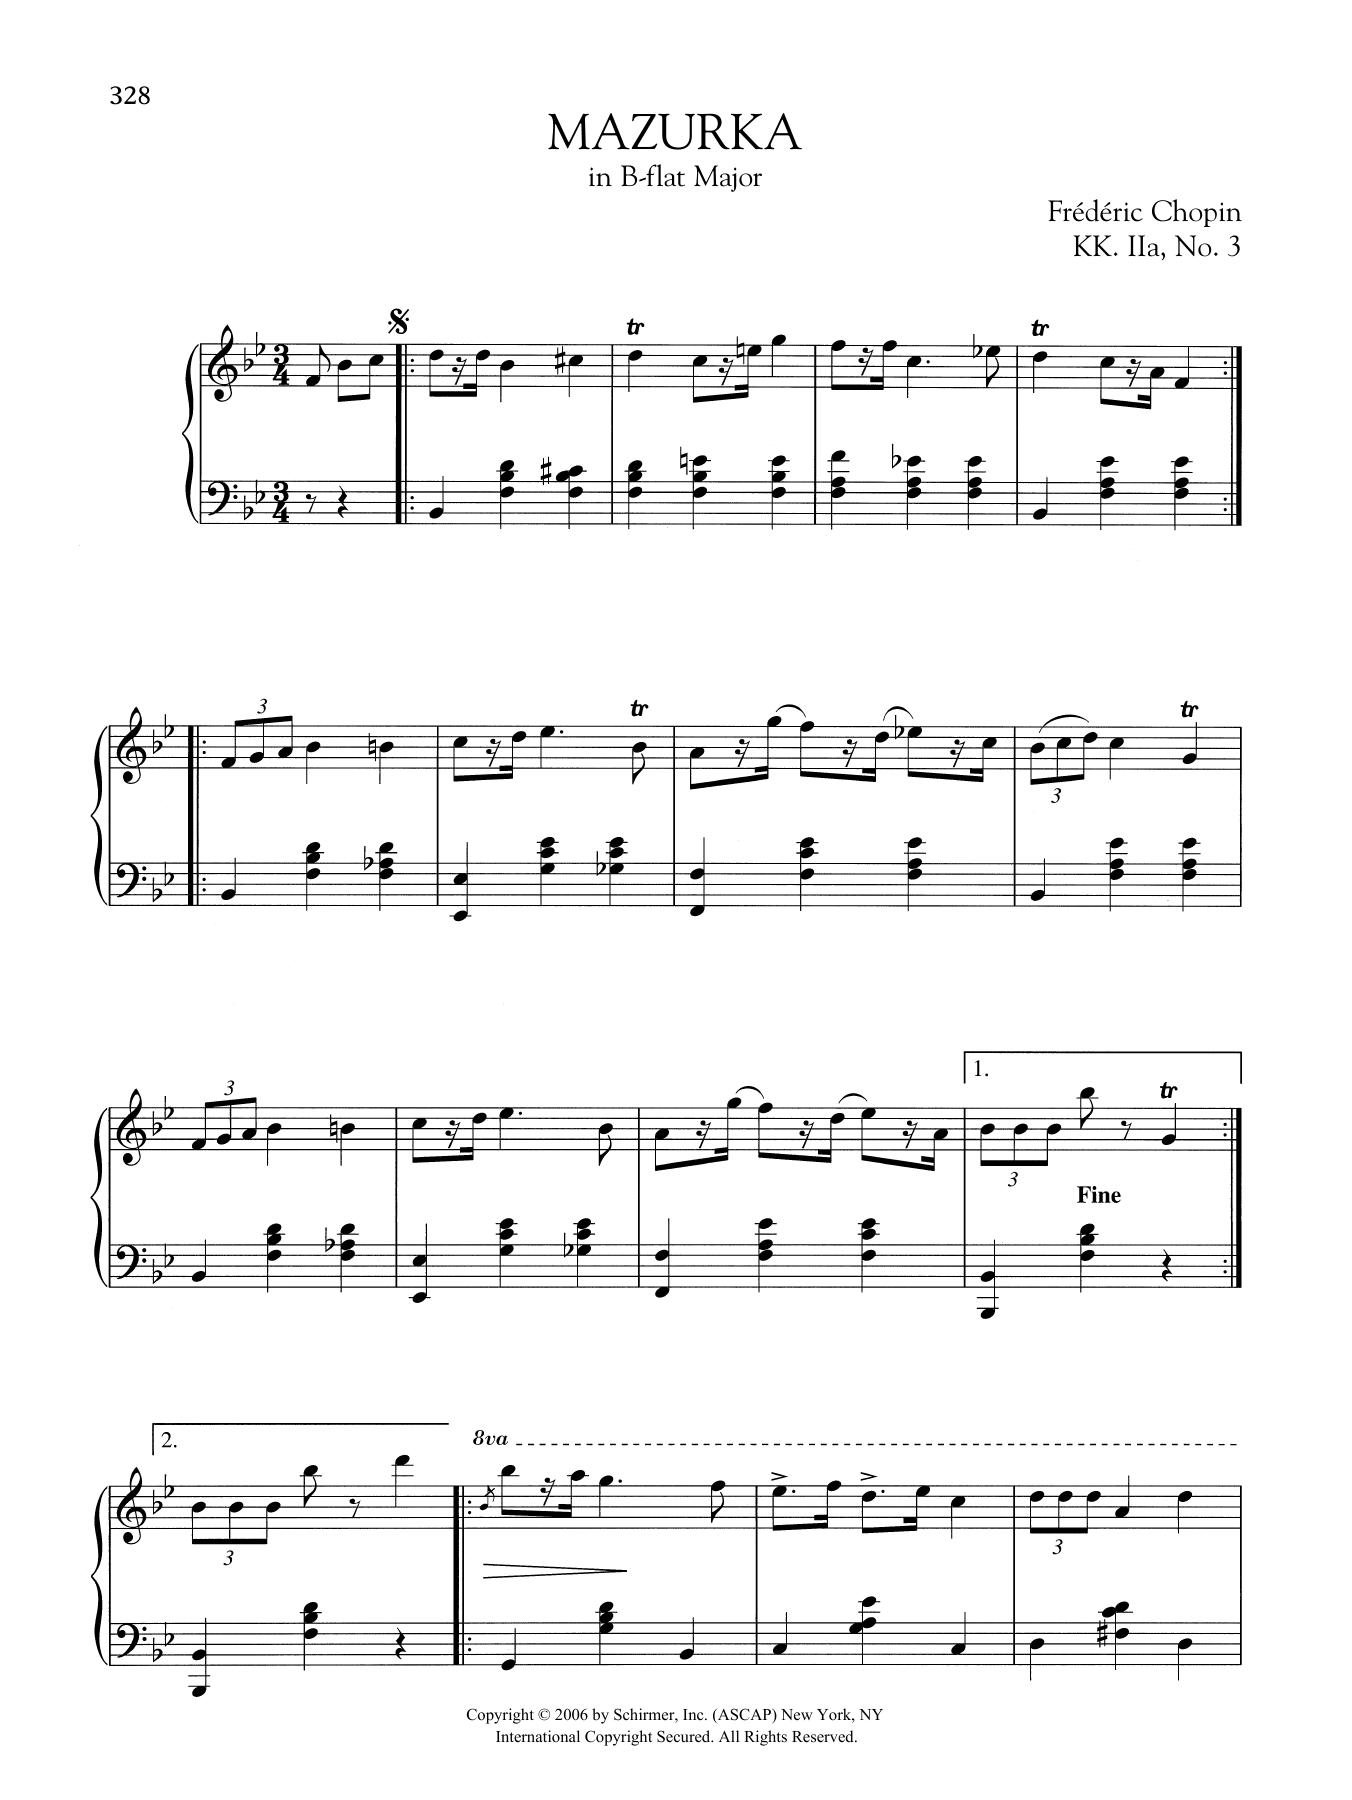 Mazurka in B-flat Major, KK. IIa, No. 3 Sheet Music